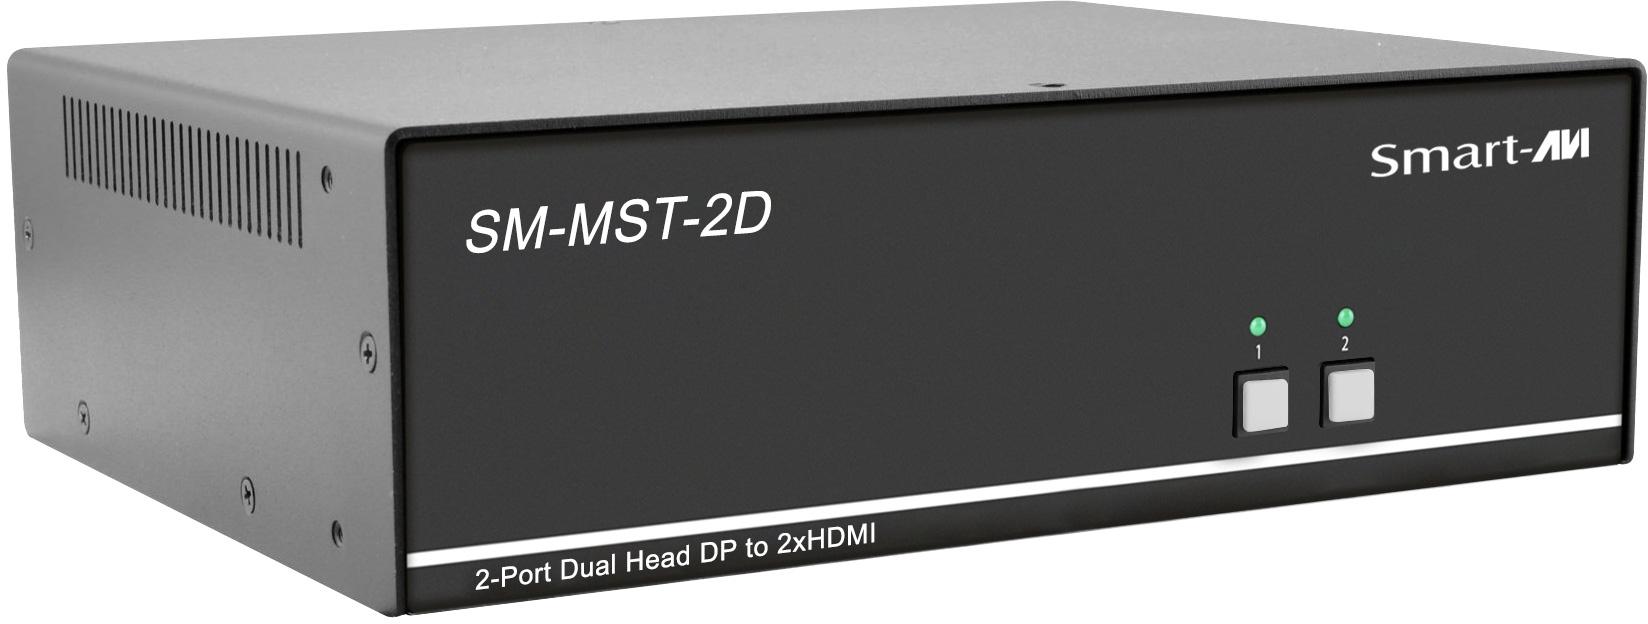 Smart AVI SM-MST-2D MultiStream Transport Technology KVM Switch with Dual 4K HDMI Out - 2 Port SAVI-SM-MST-2D